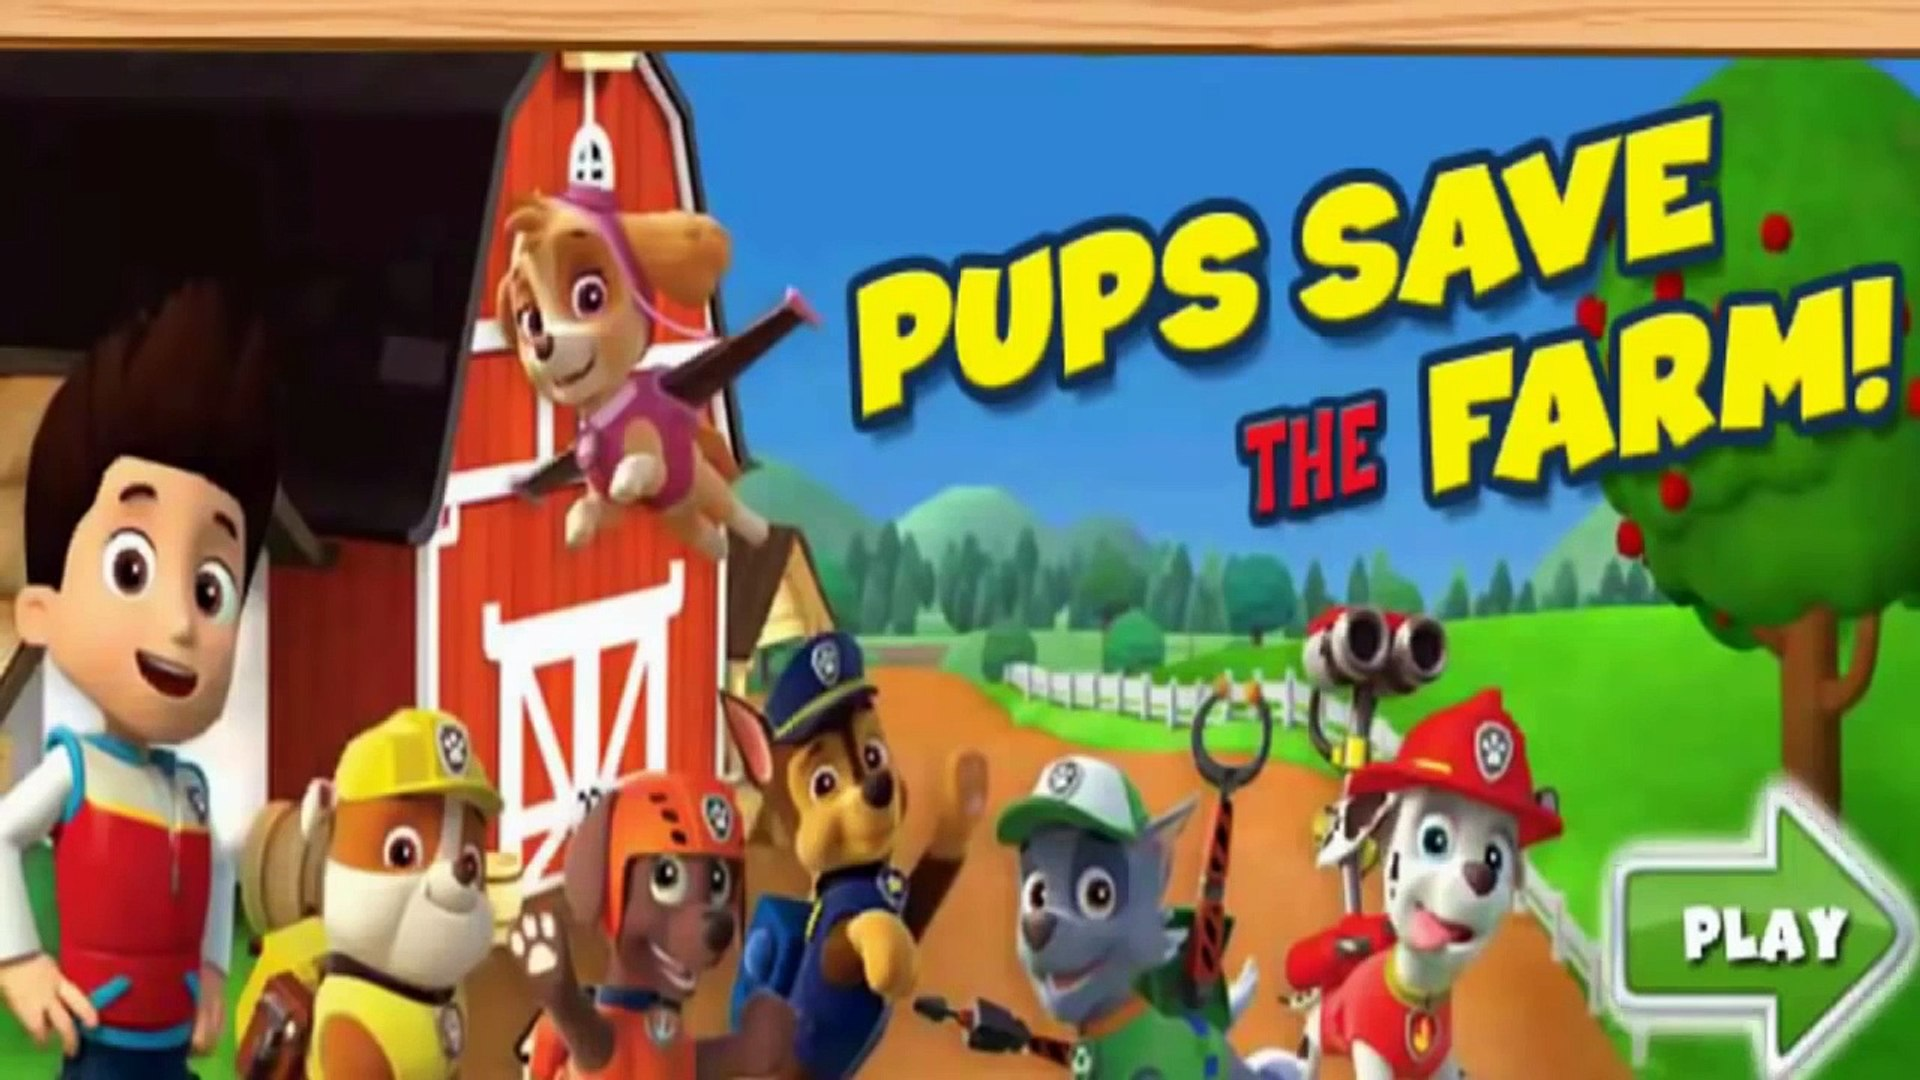 Paw Patrol Hd Full Episodes - Paw Patrol Cartoon Episodes In English_ Full game for Kids 2015